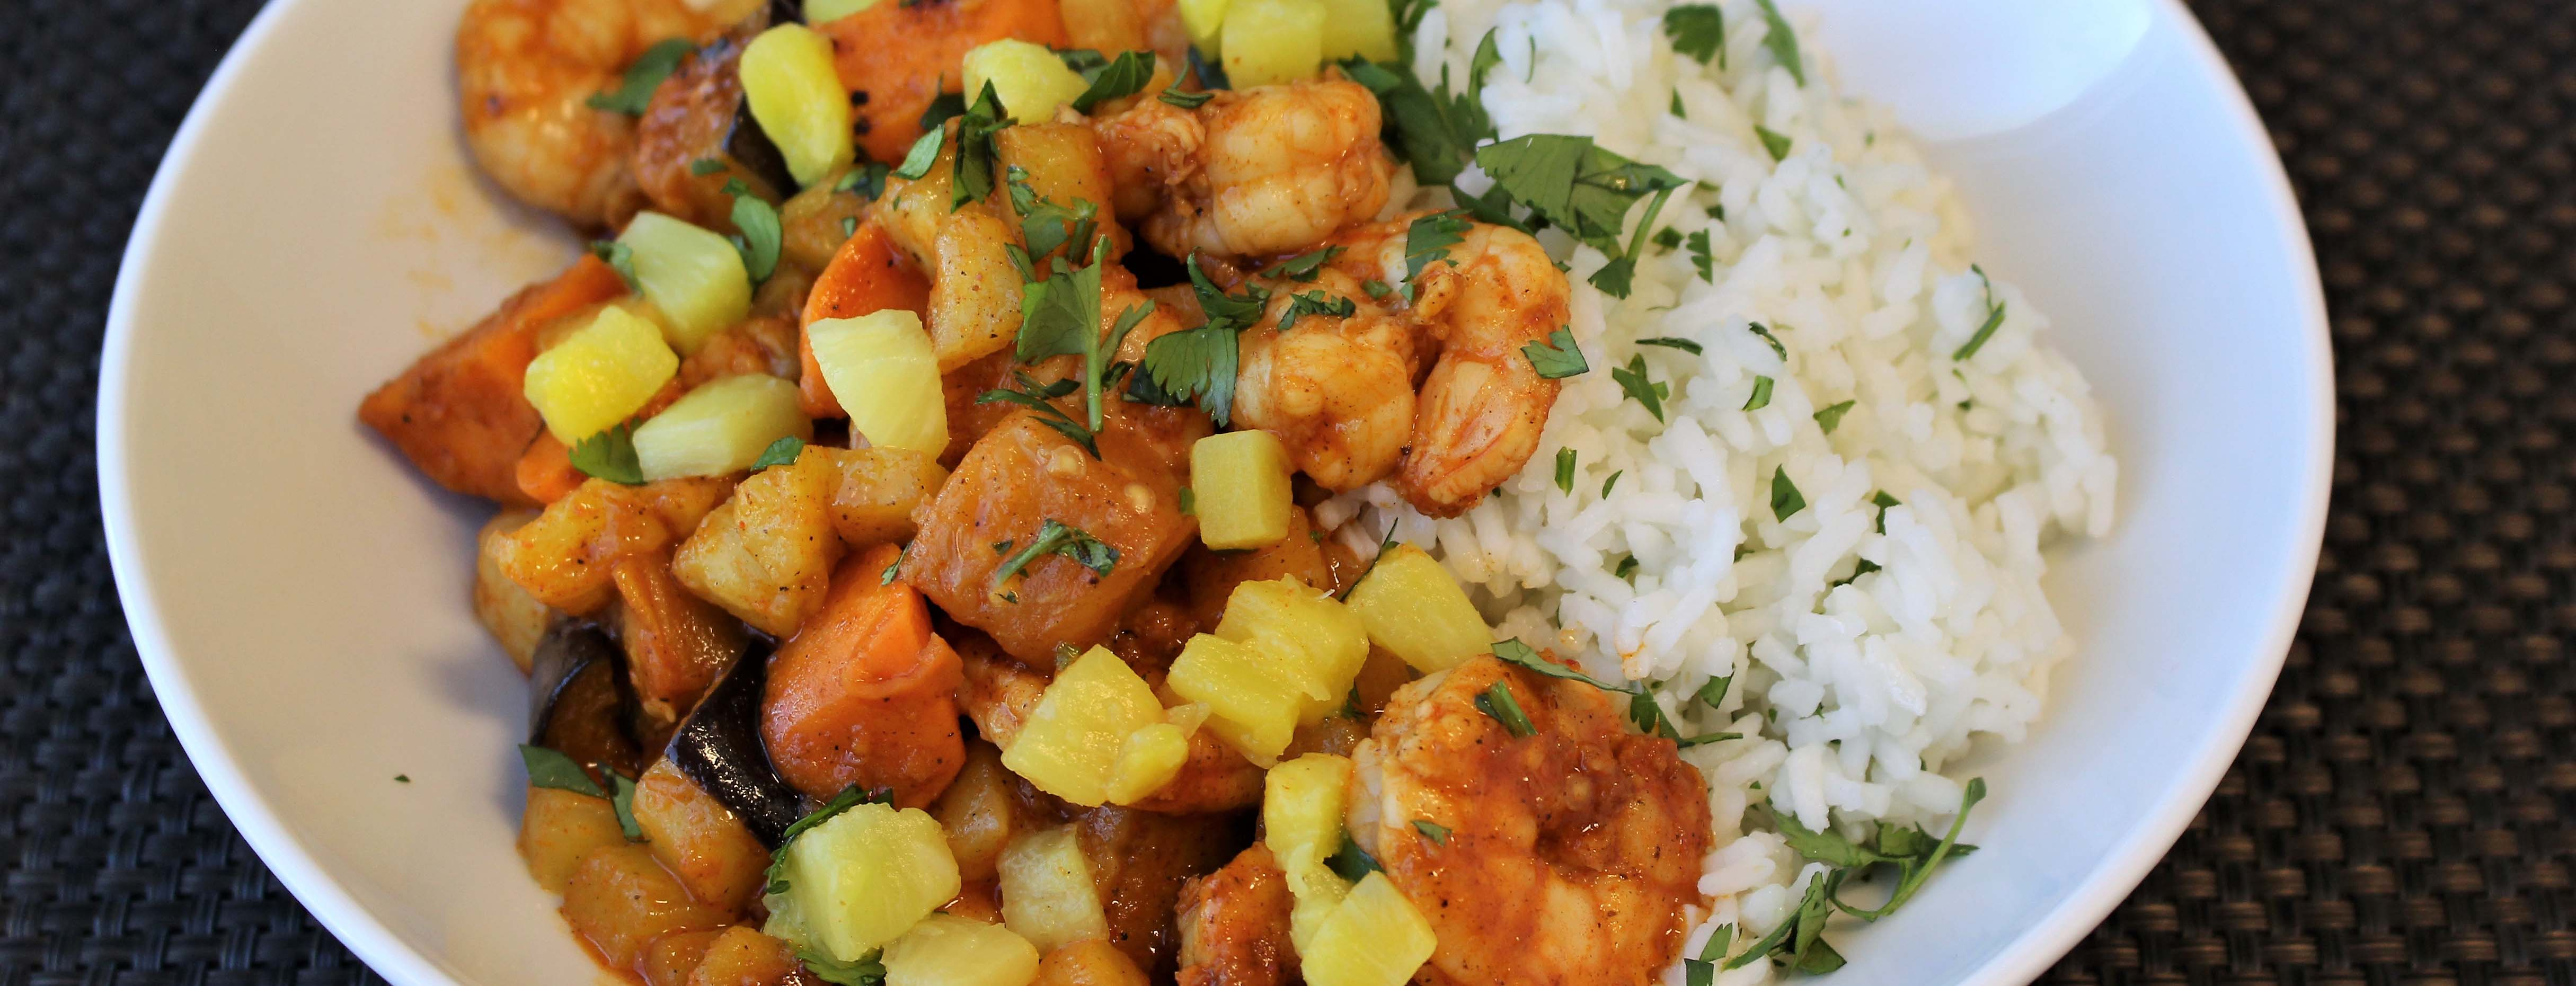 Photo of Piri Piri Shrimp and Pineapple Stir Fry